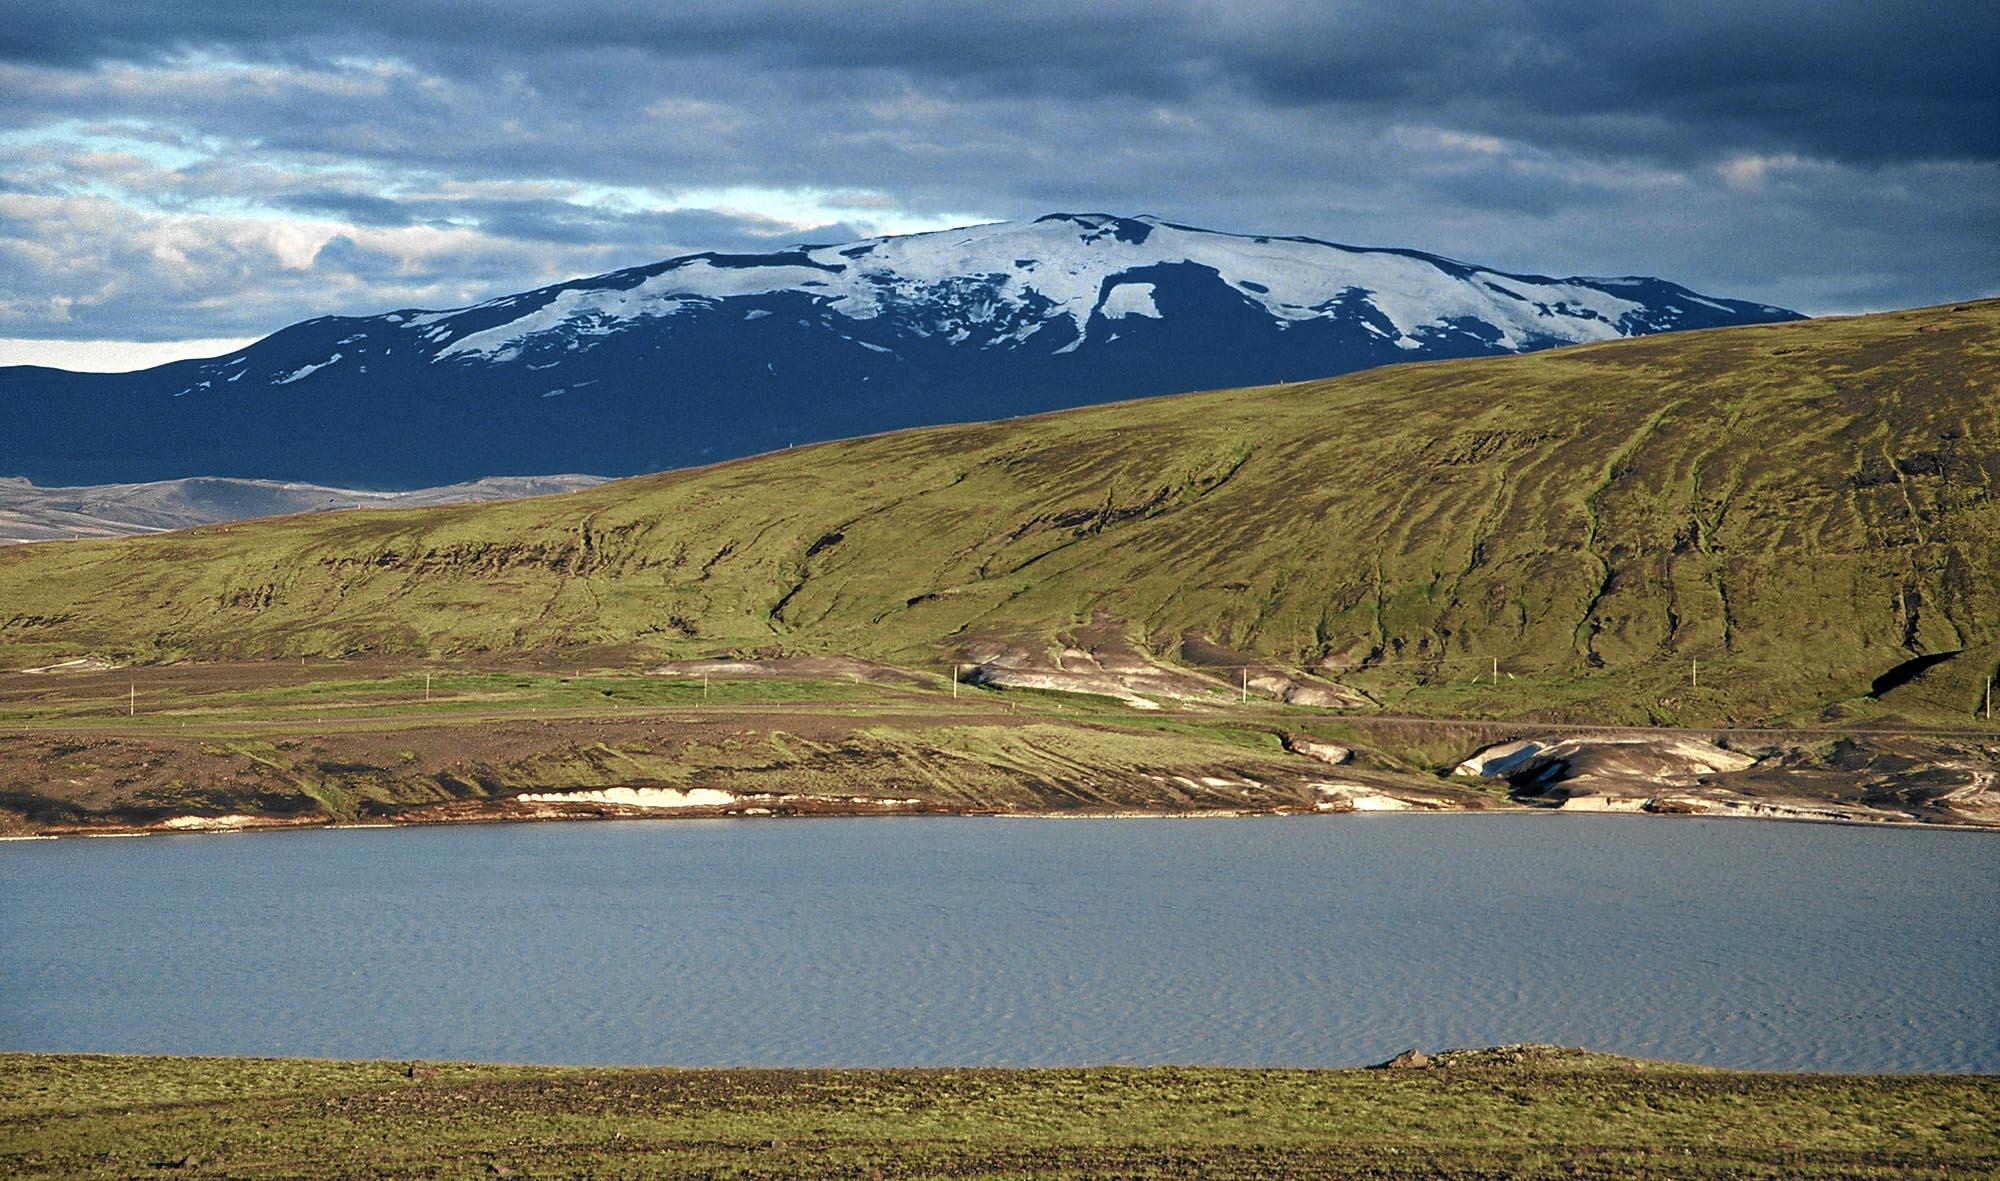 island-hekla-schatten-small